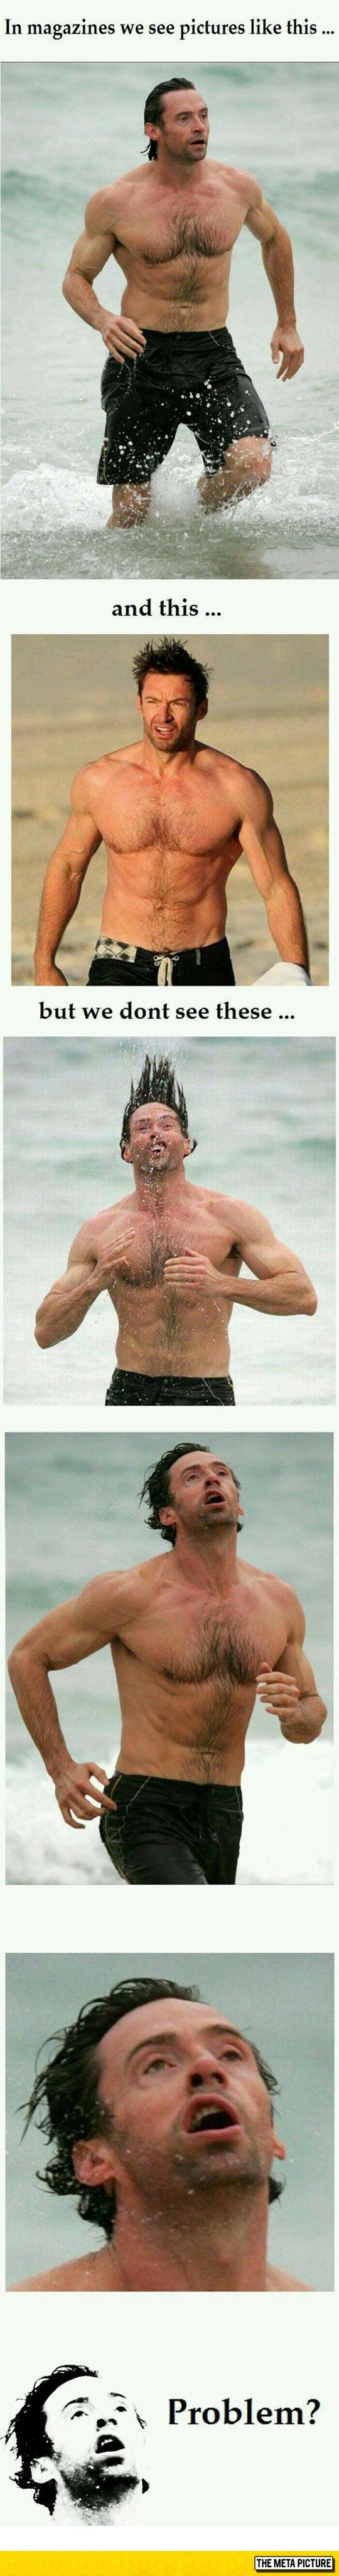 funny-Hugh-Jackman-face-beach